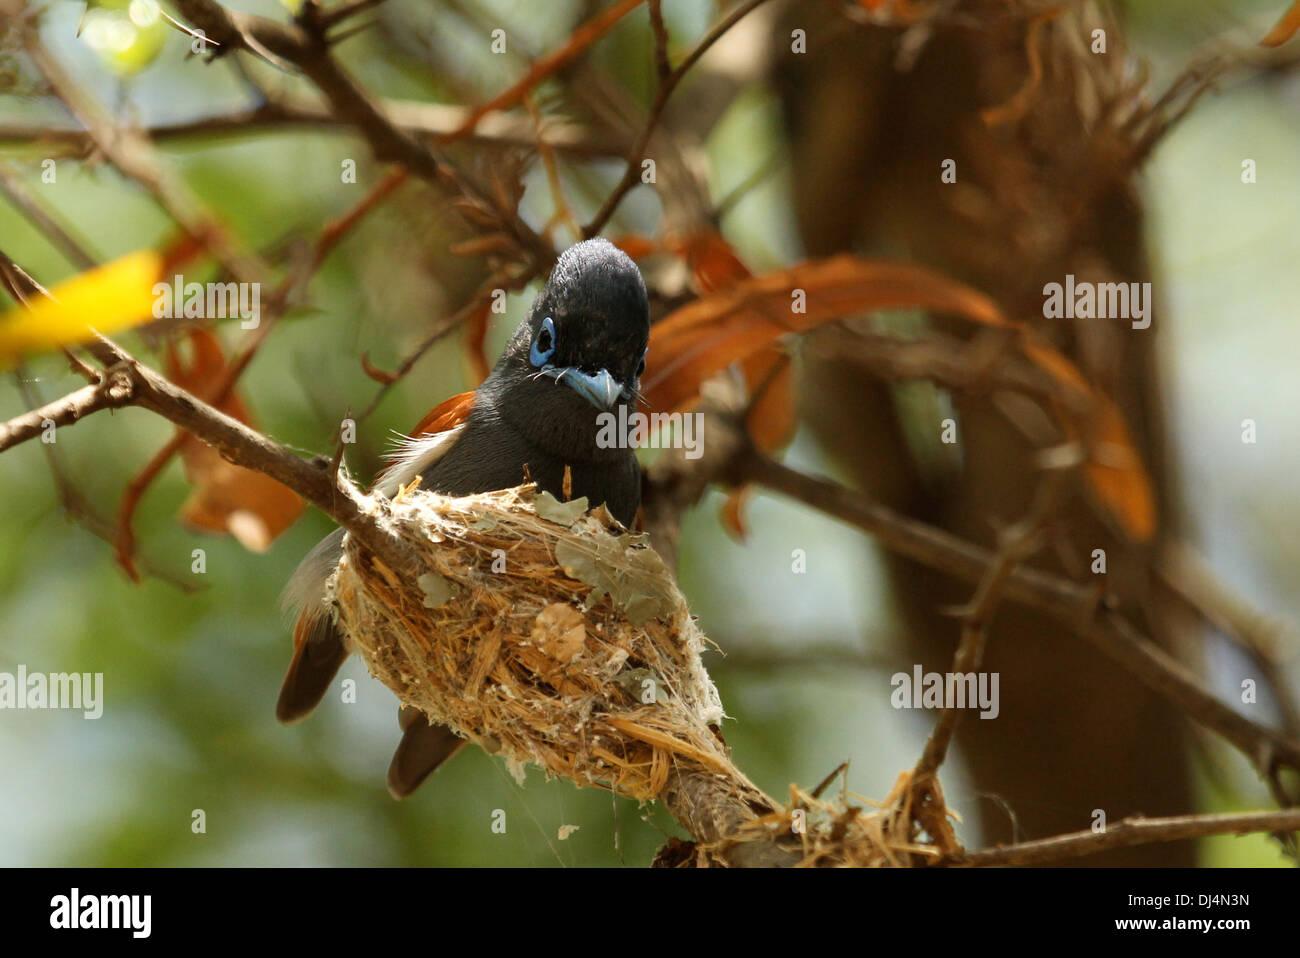 African Paradise Flycatcher at nest Terpsiphone viridis Stock Photo